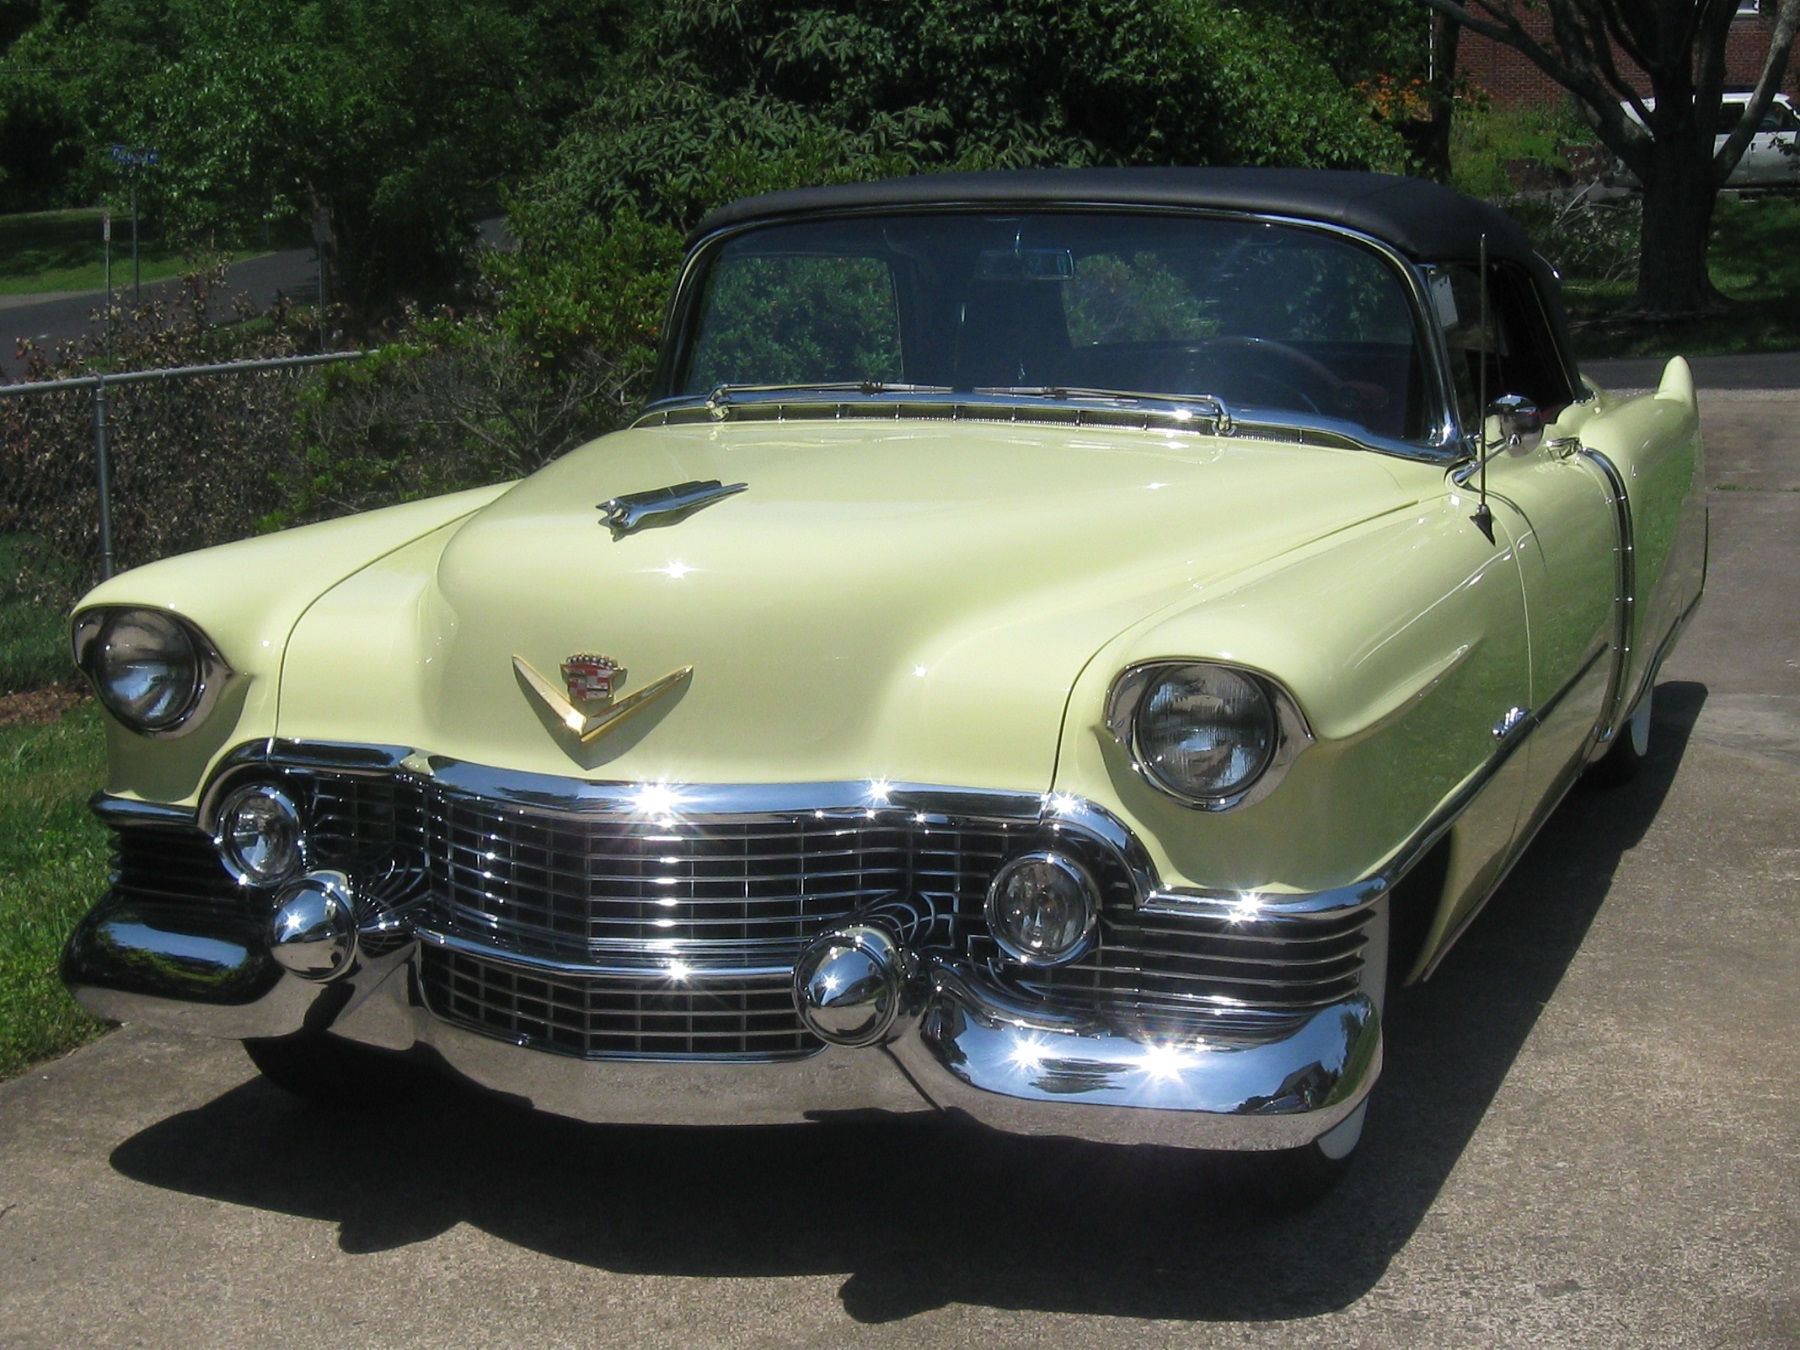 2016 Cadillac Convertible >> 1954 Cadillac Convertible Gets Full Restoration Classic Classics